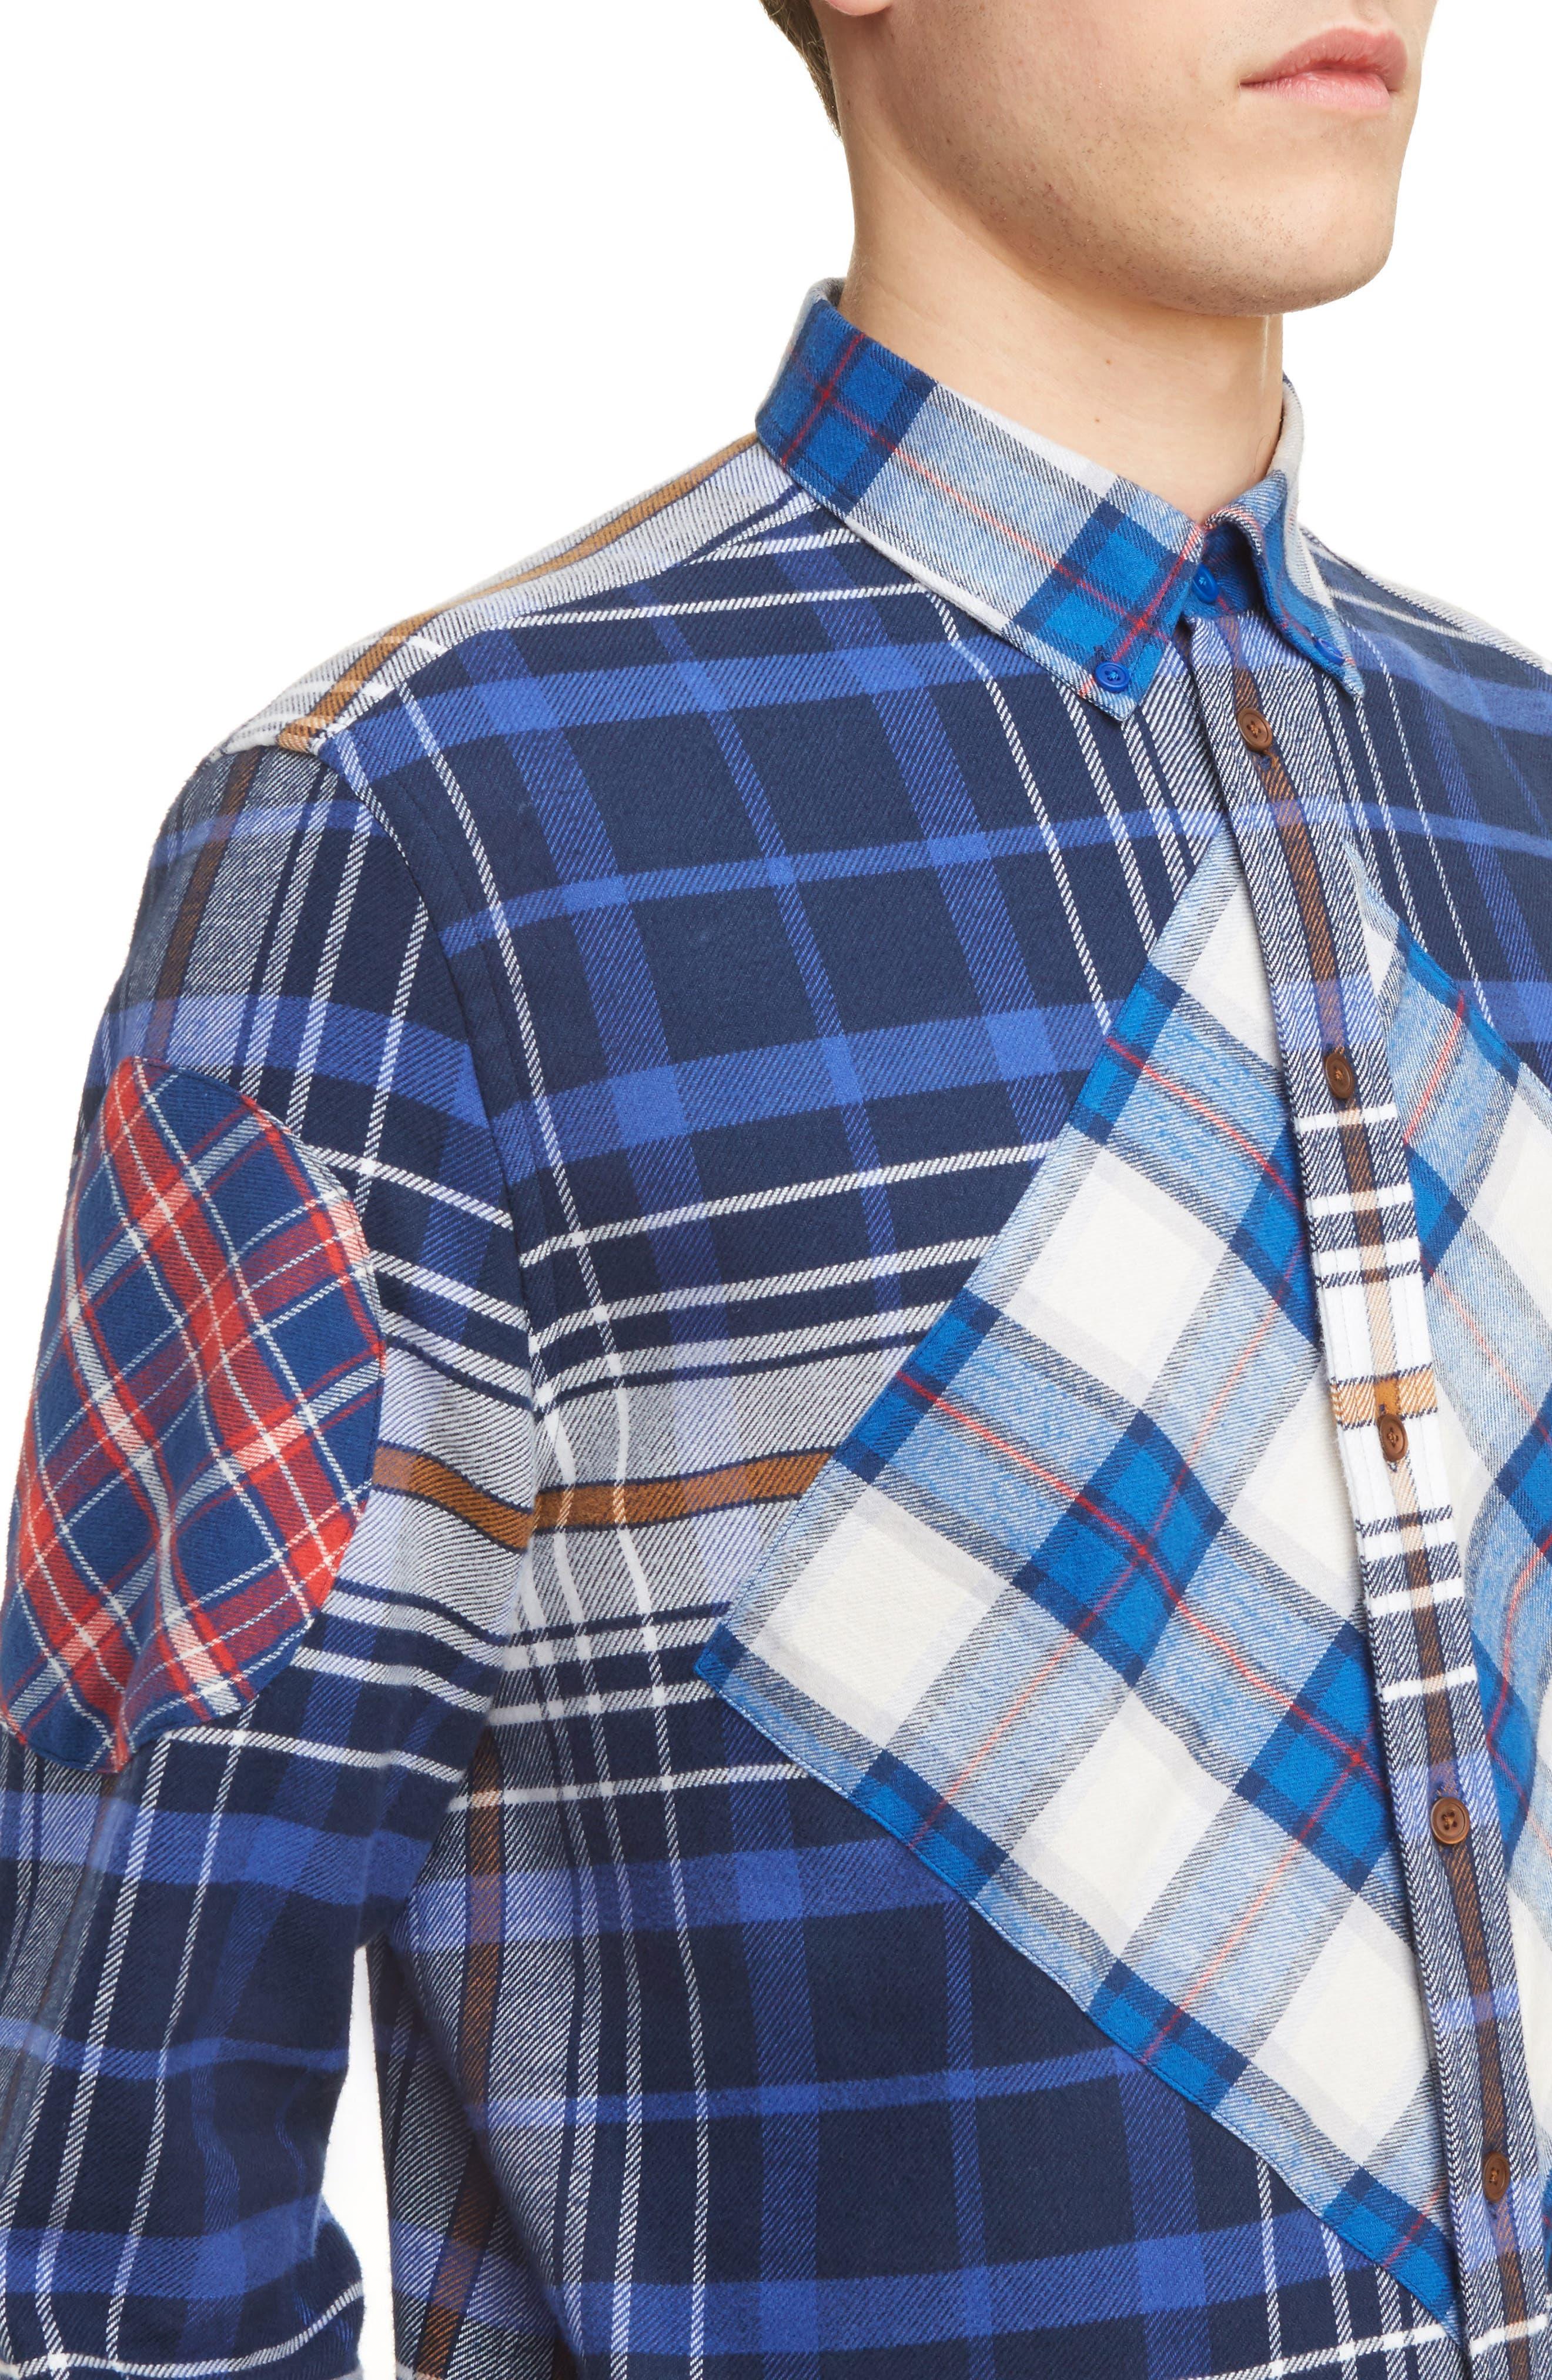 Cuban Fit Pieced Flannel Shirt,                             Alternate thumbnail 5, color,                             400